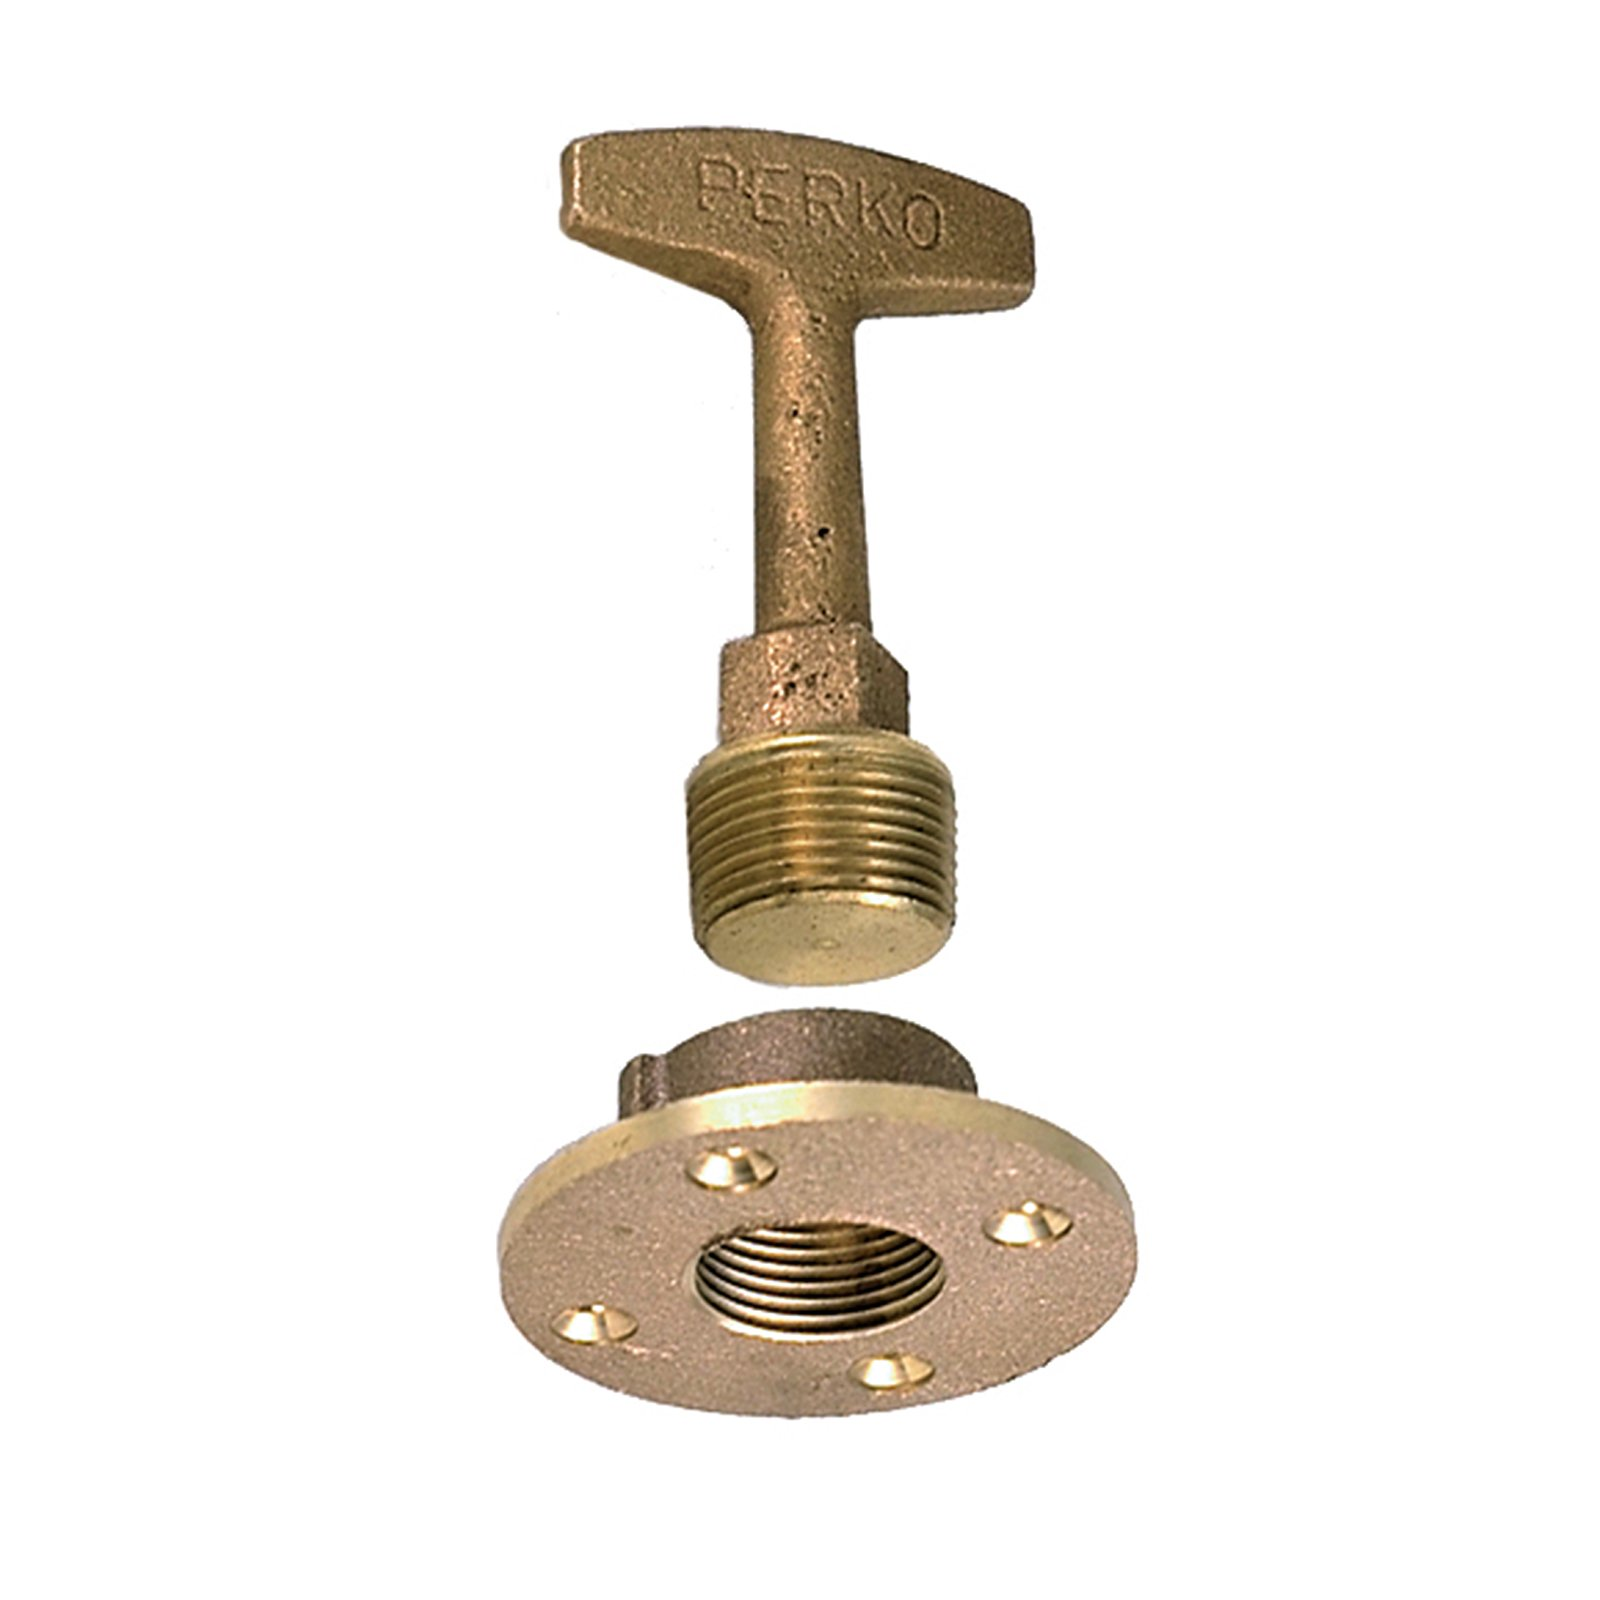 Perko 0266DP0PLB Garboard Drain Plug by Perko